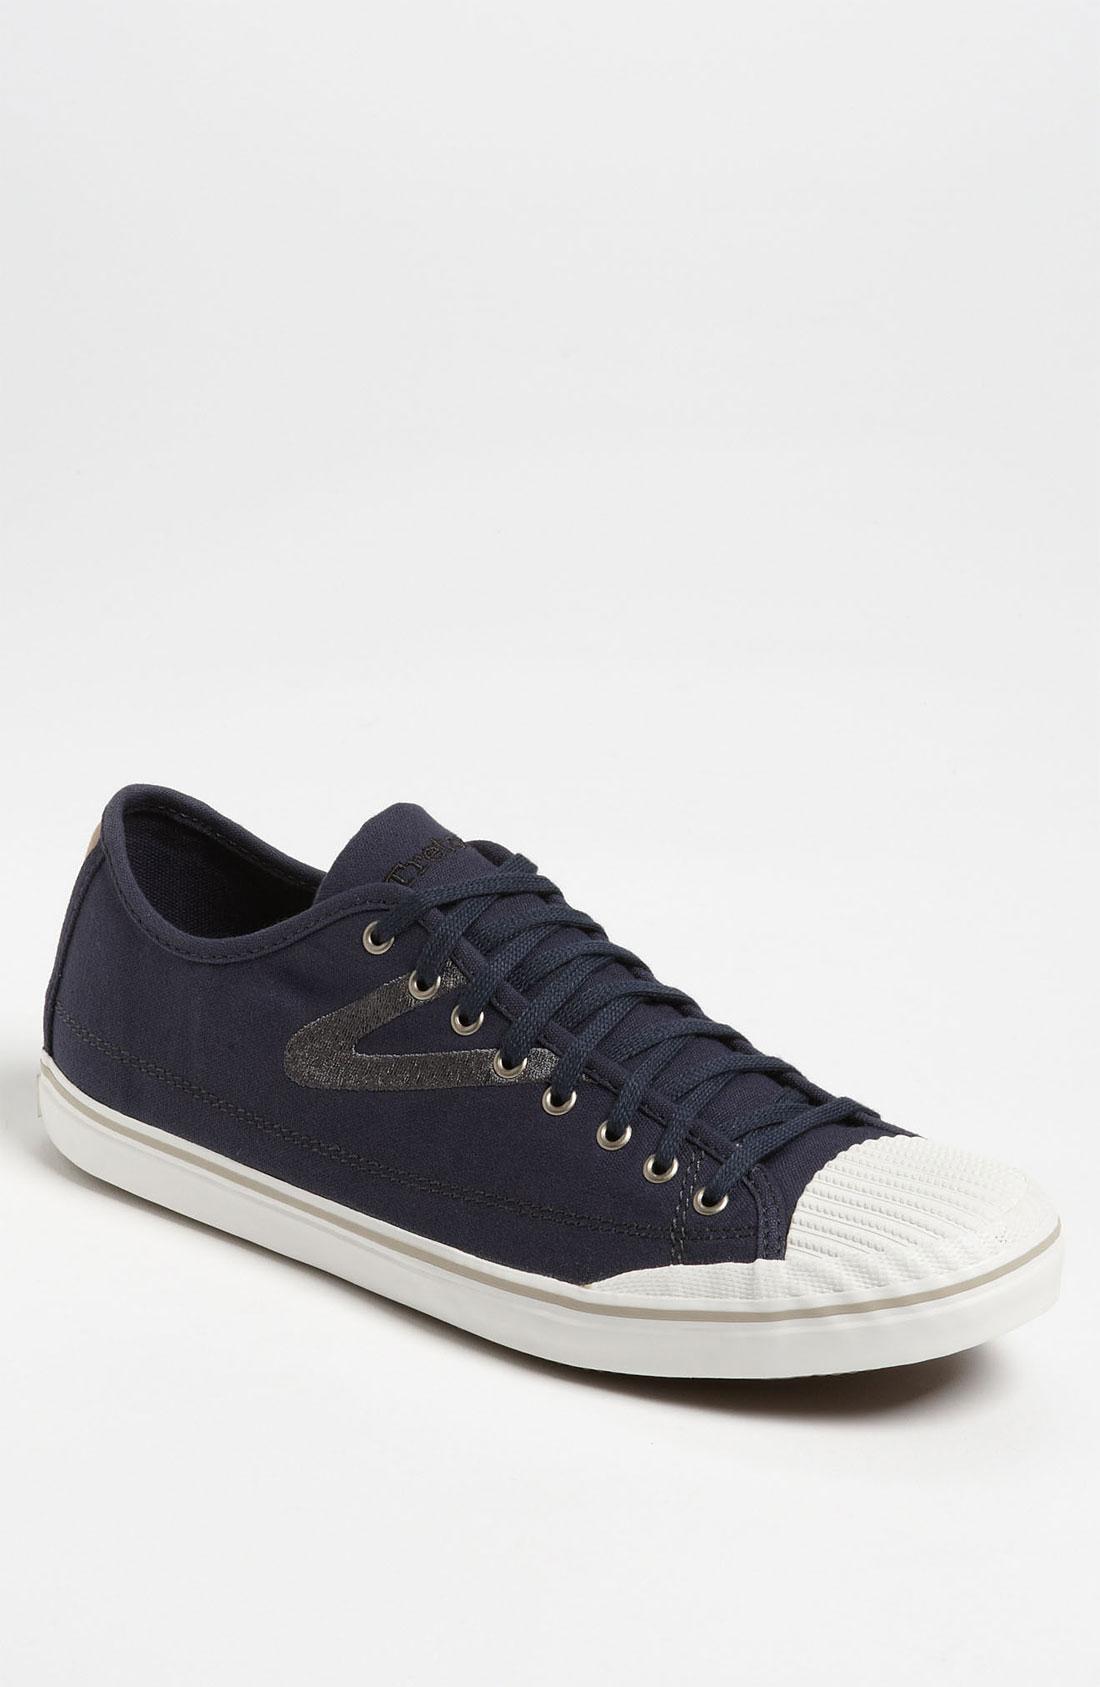 Tretorn Fashion Sneakers Mens